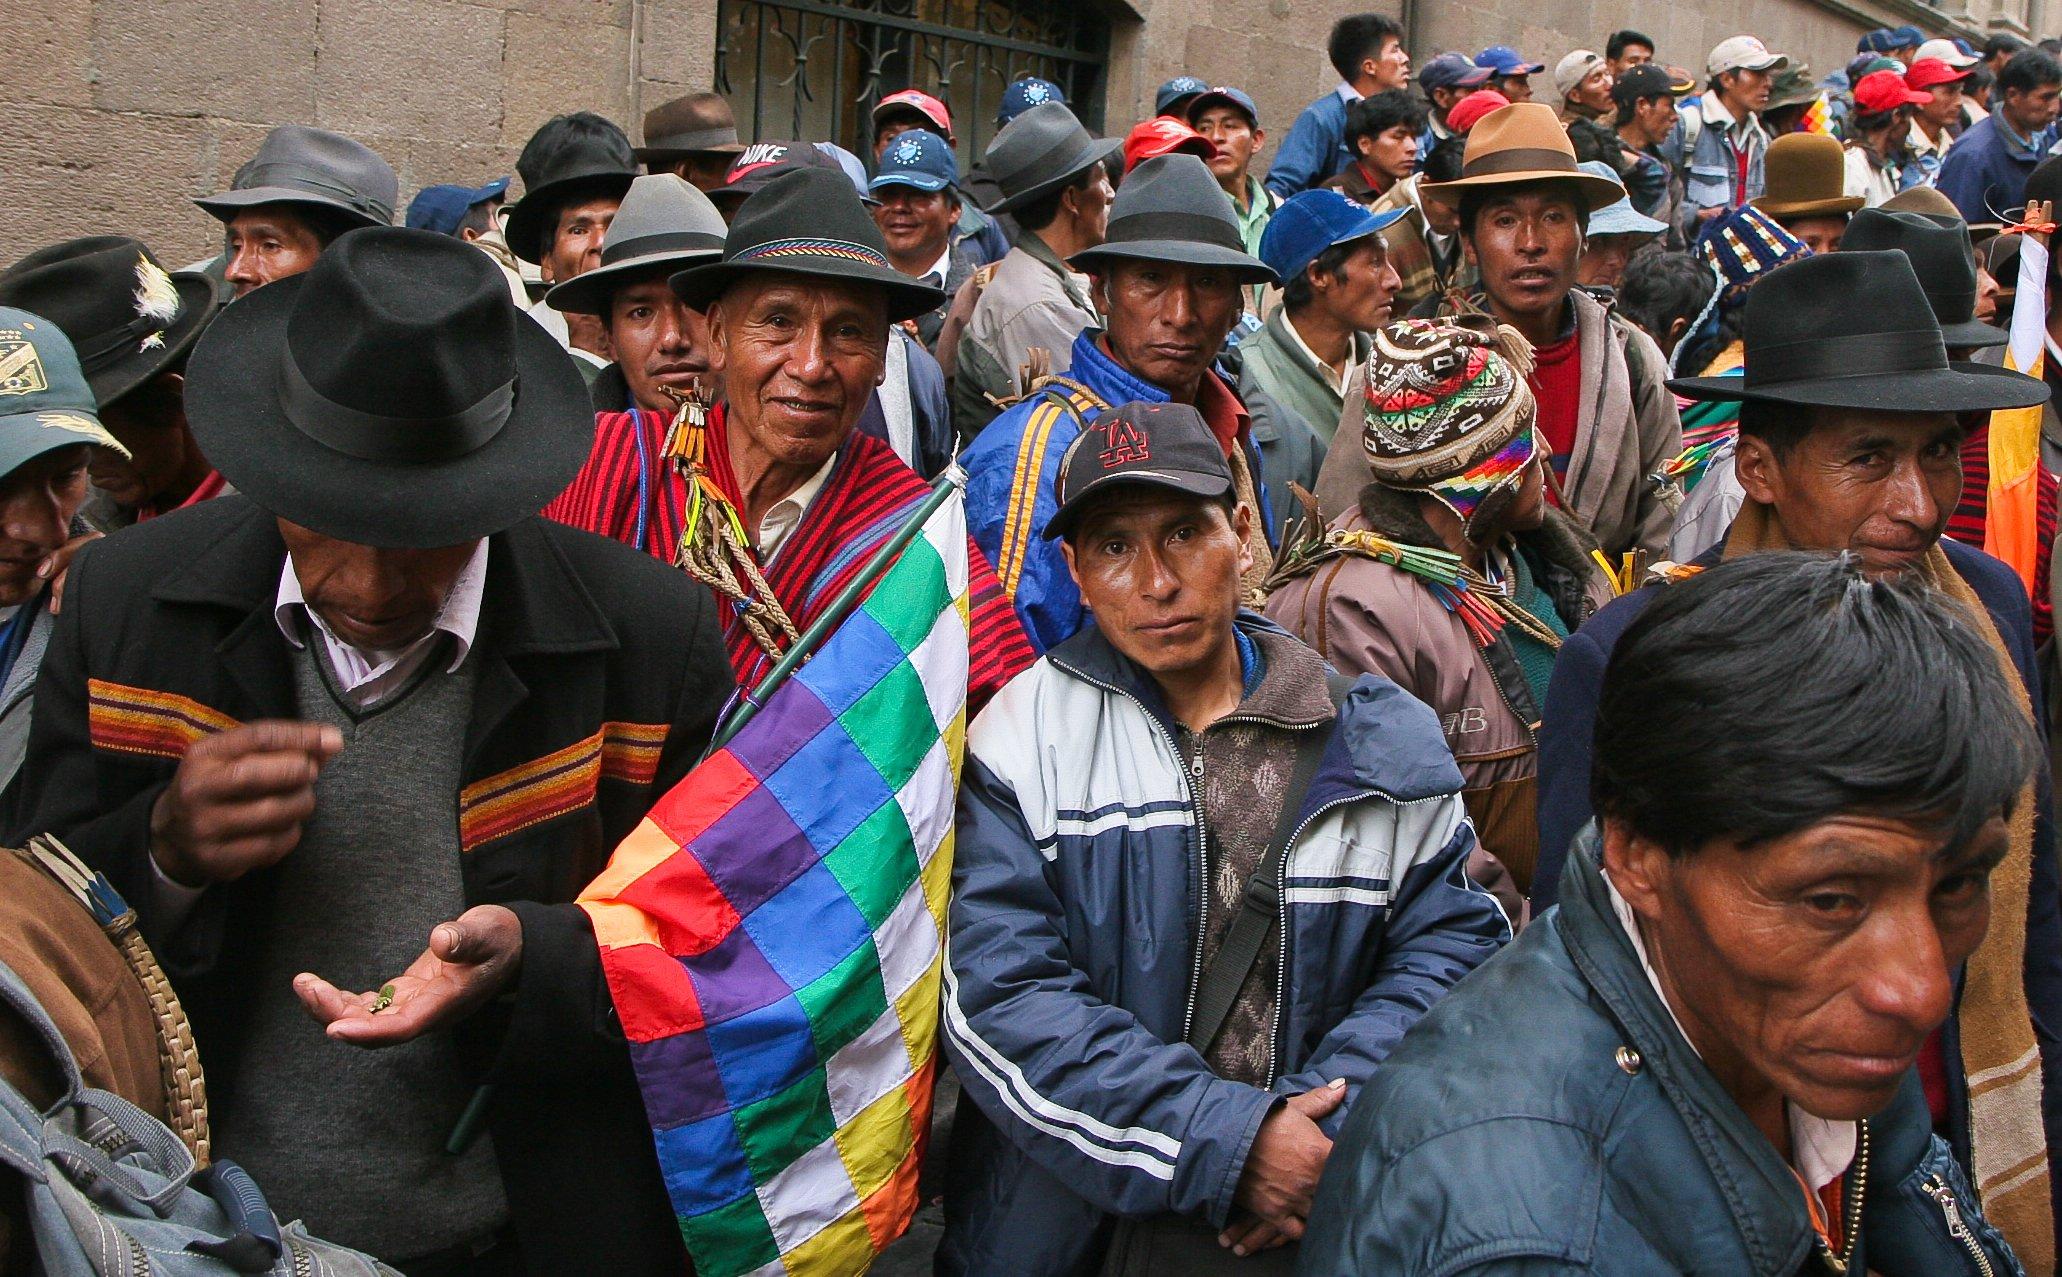 Racisme in Bolivia: apartheidsregime van voor 2000 is terug, maar dan zonder toekomst